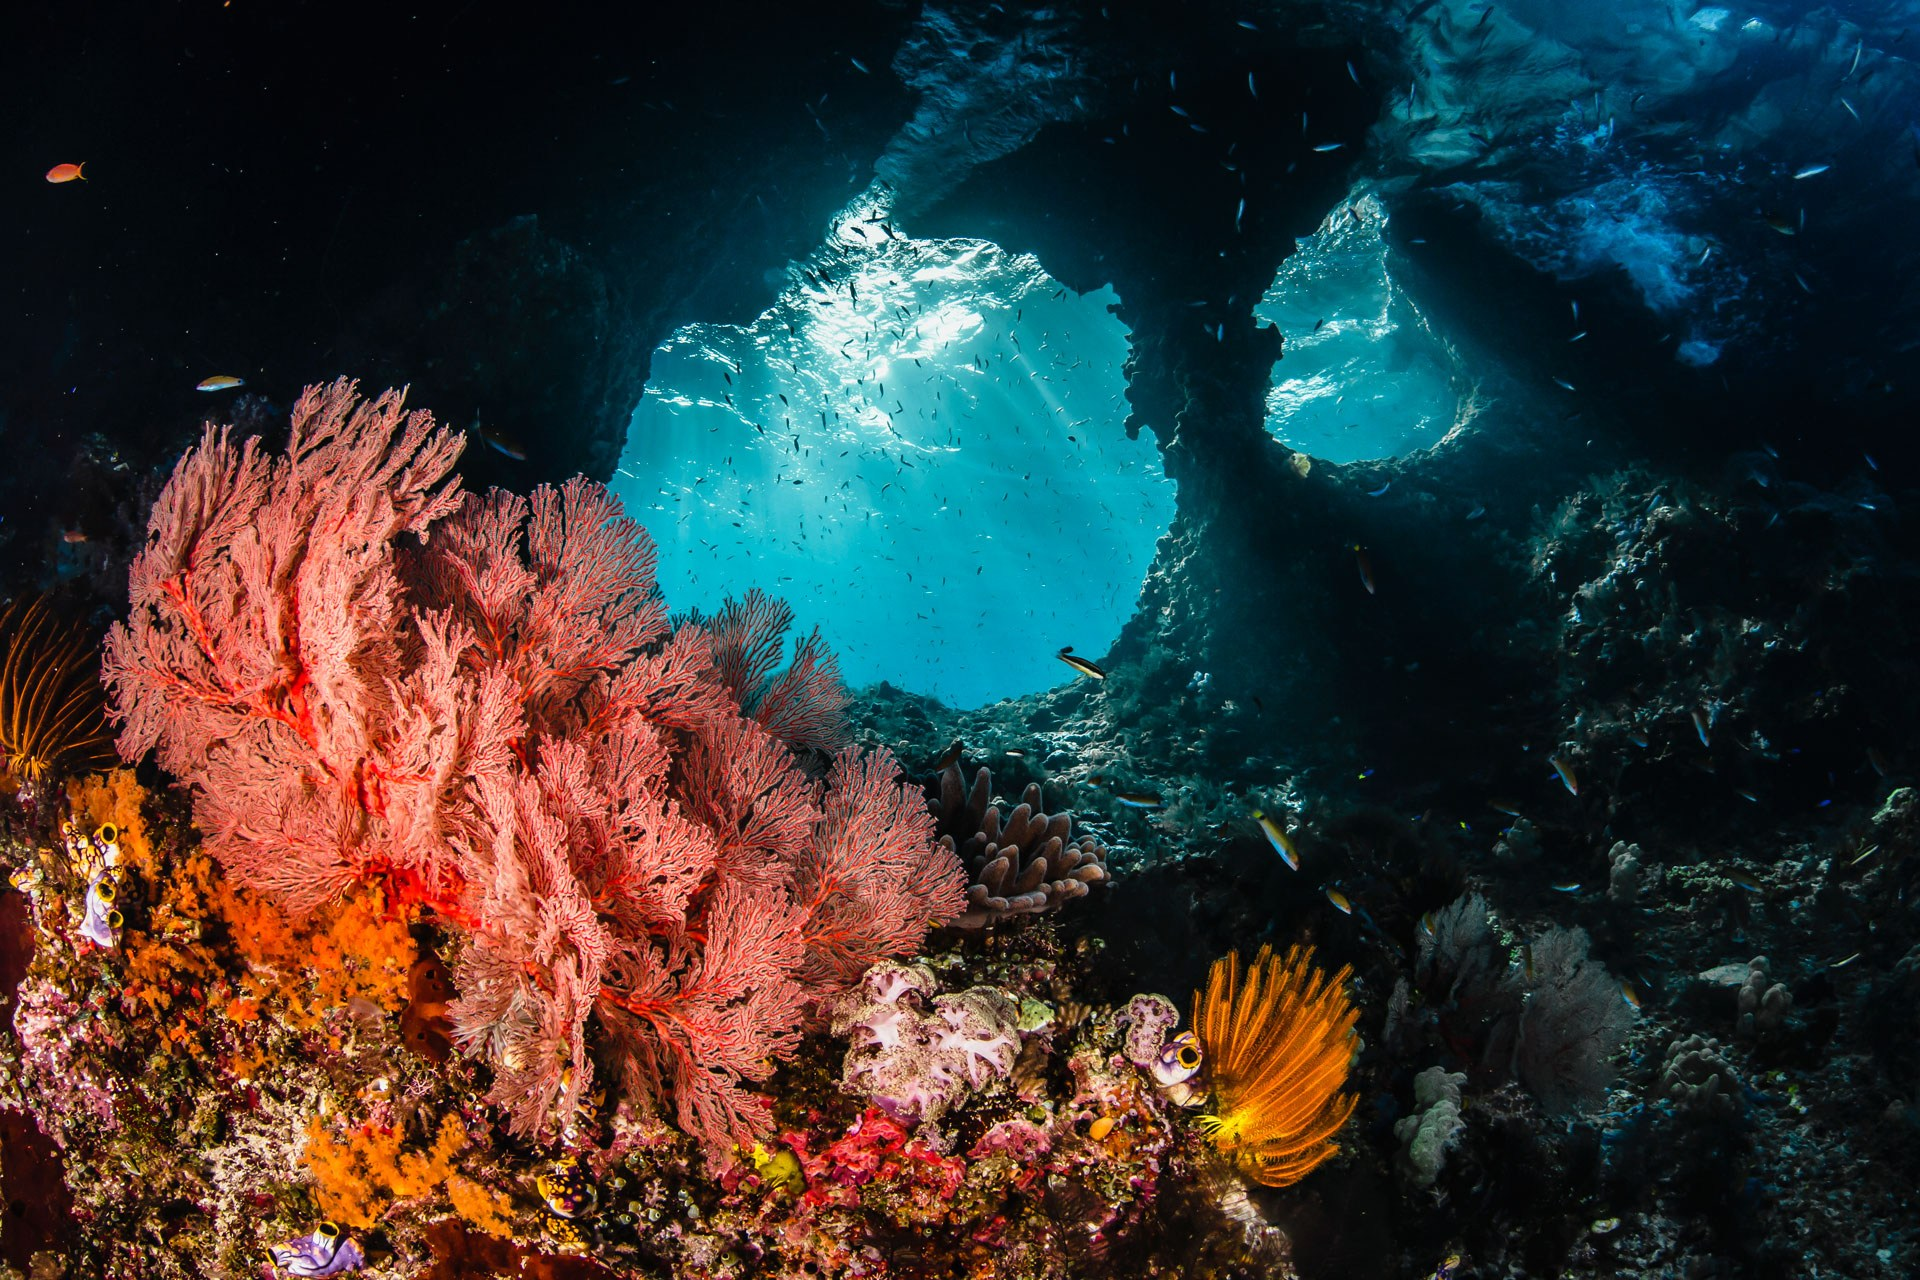 Raja-Ampat-Nature-Underwater-Diving-Photo.jpg